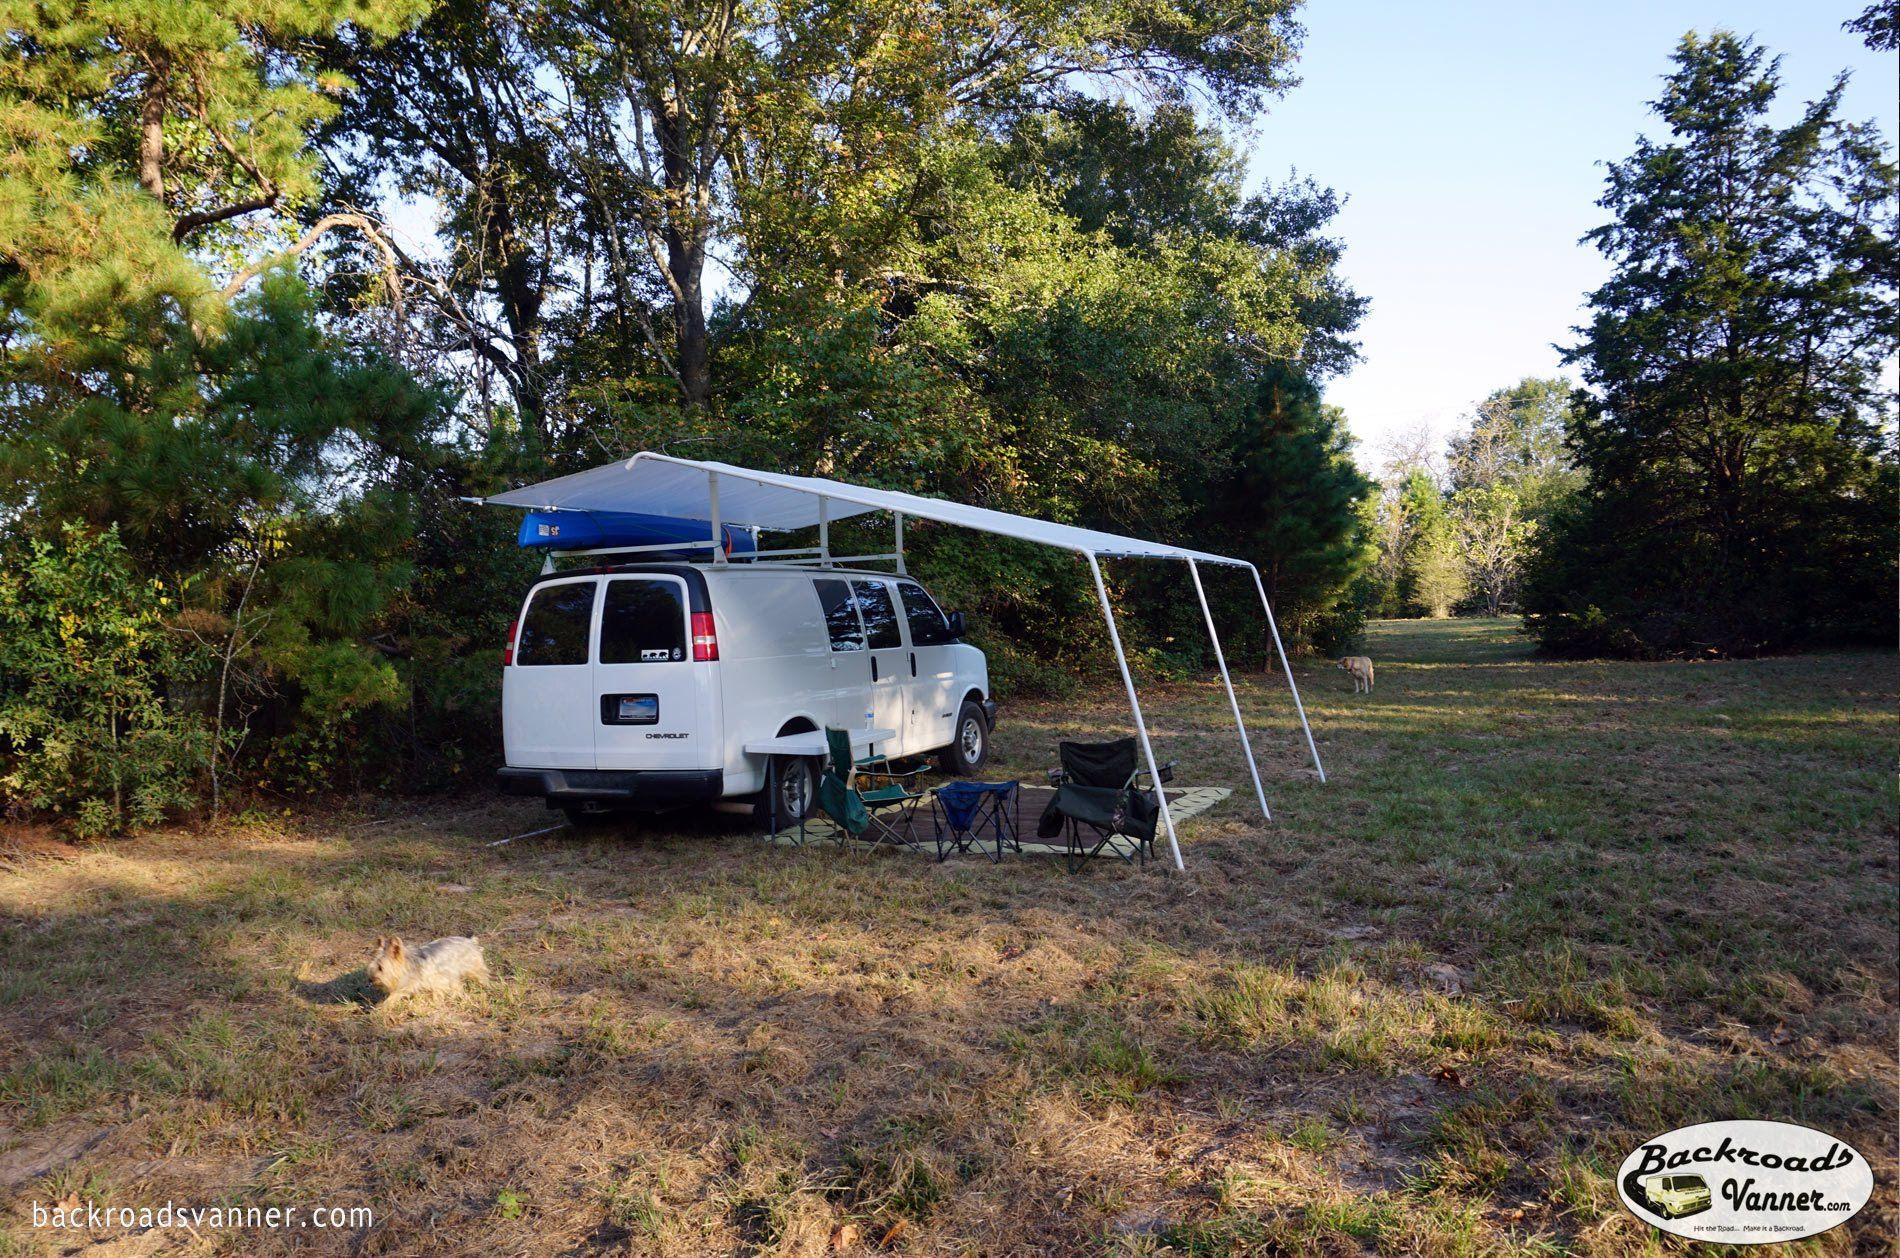 van life custom van awning system how to diy van canopy so